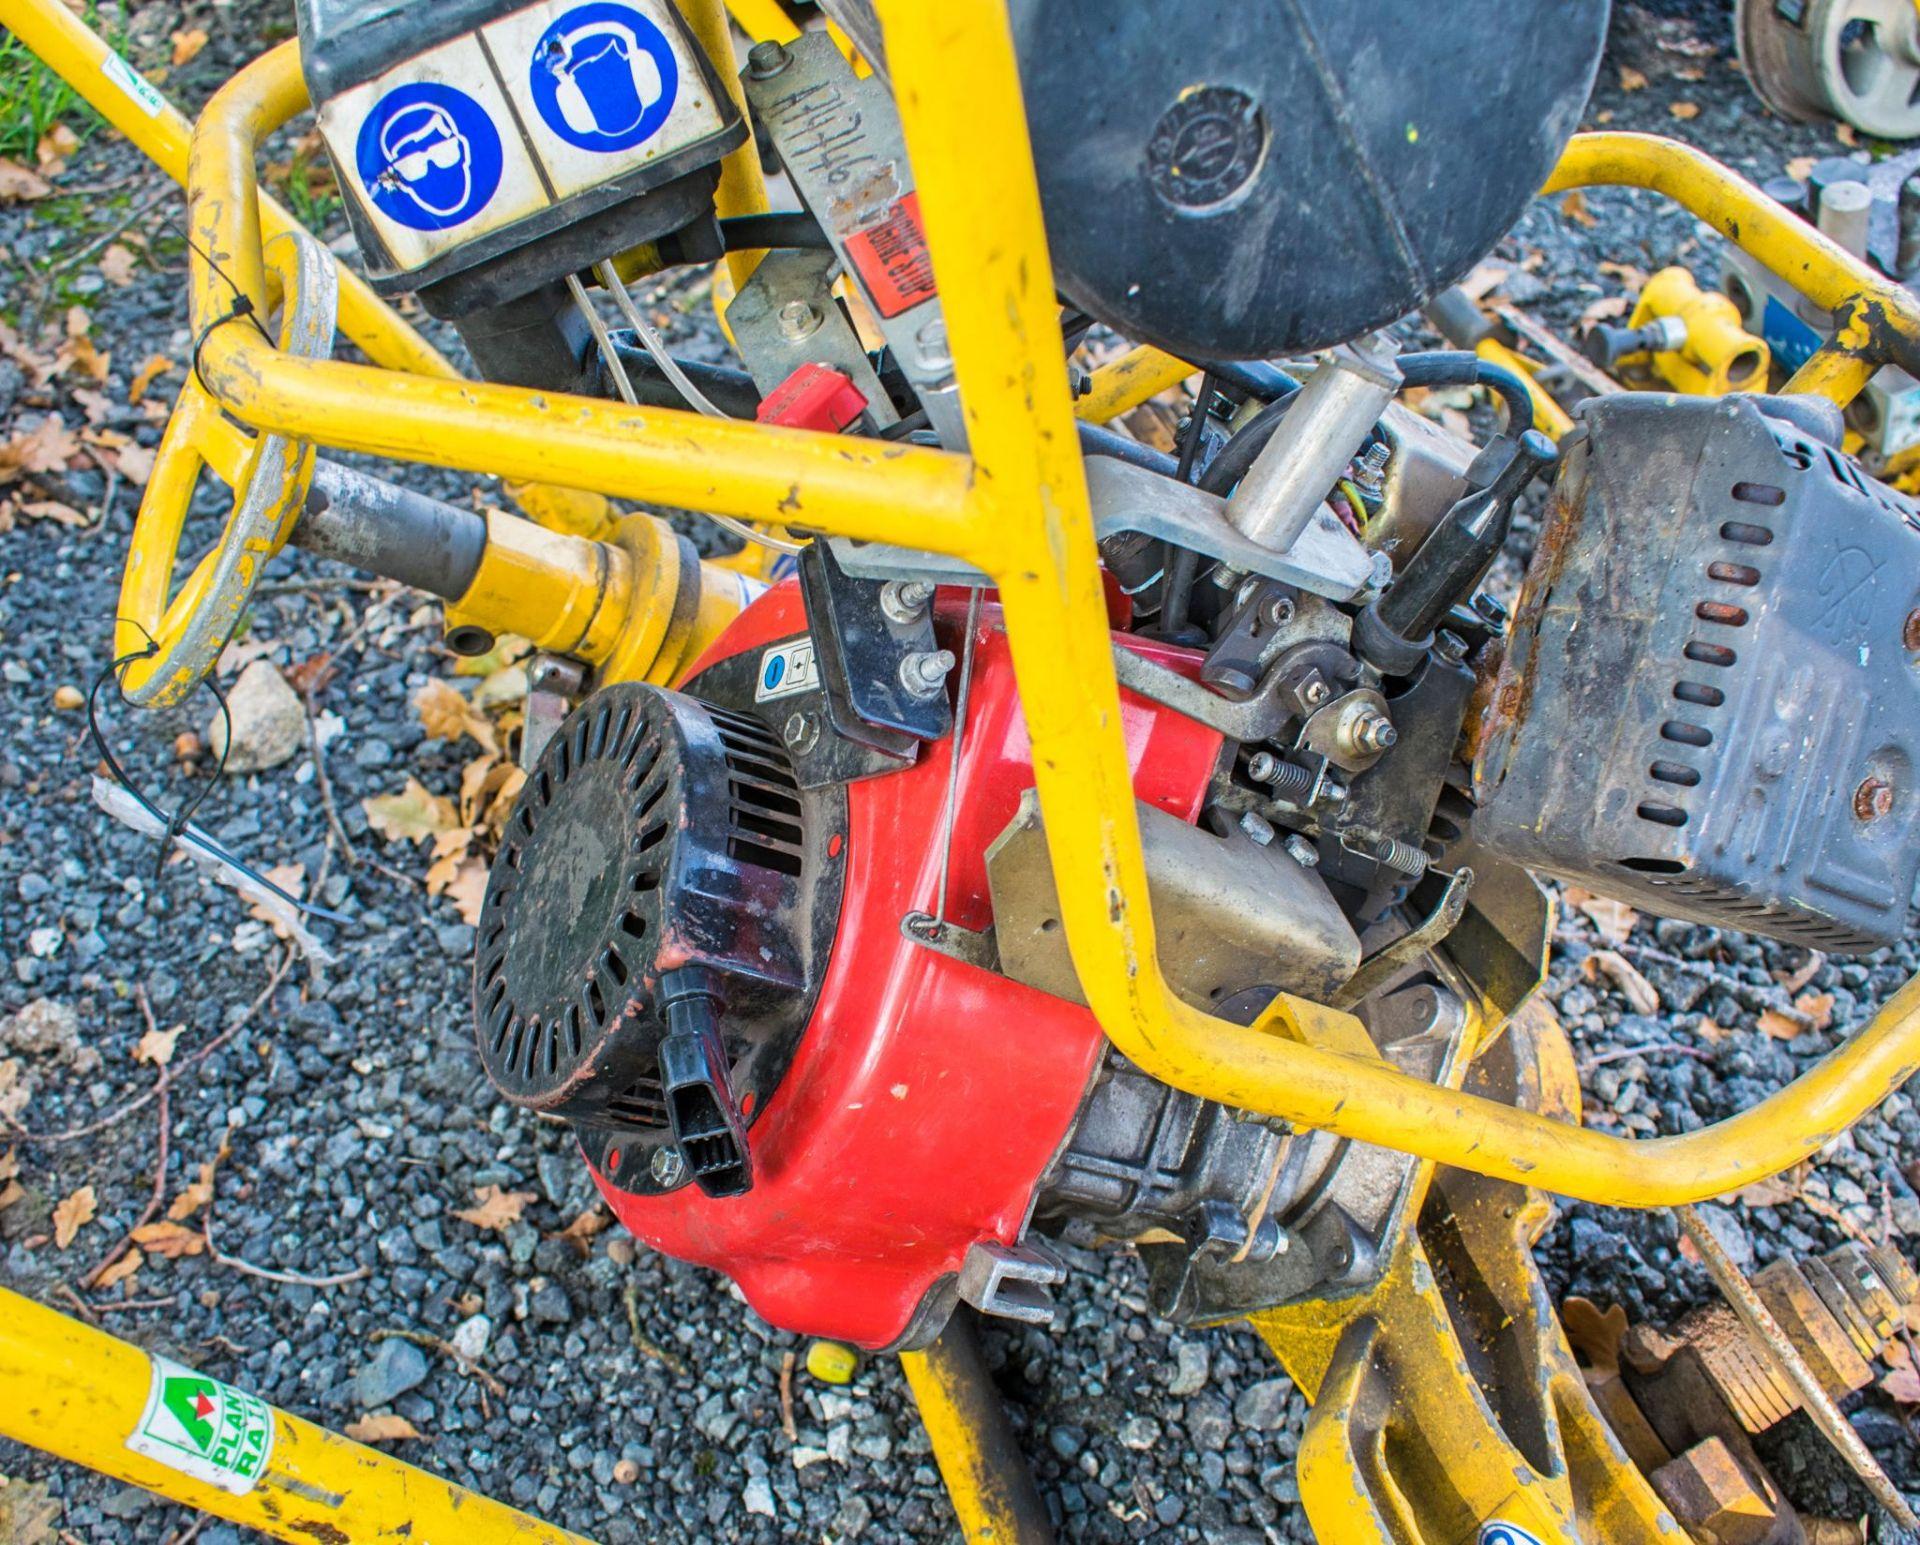 Geismar petrol driven rail grinder A747461 - Image 2 of 2